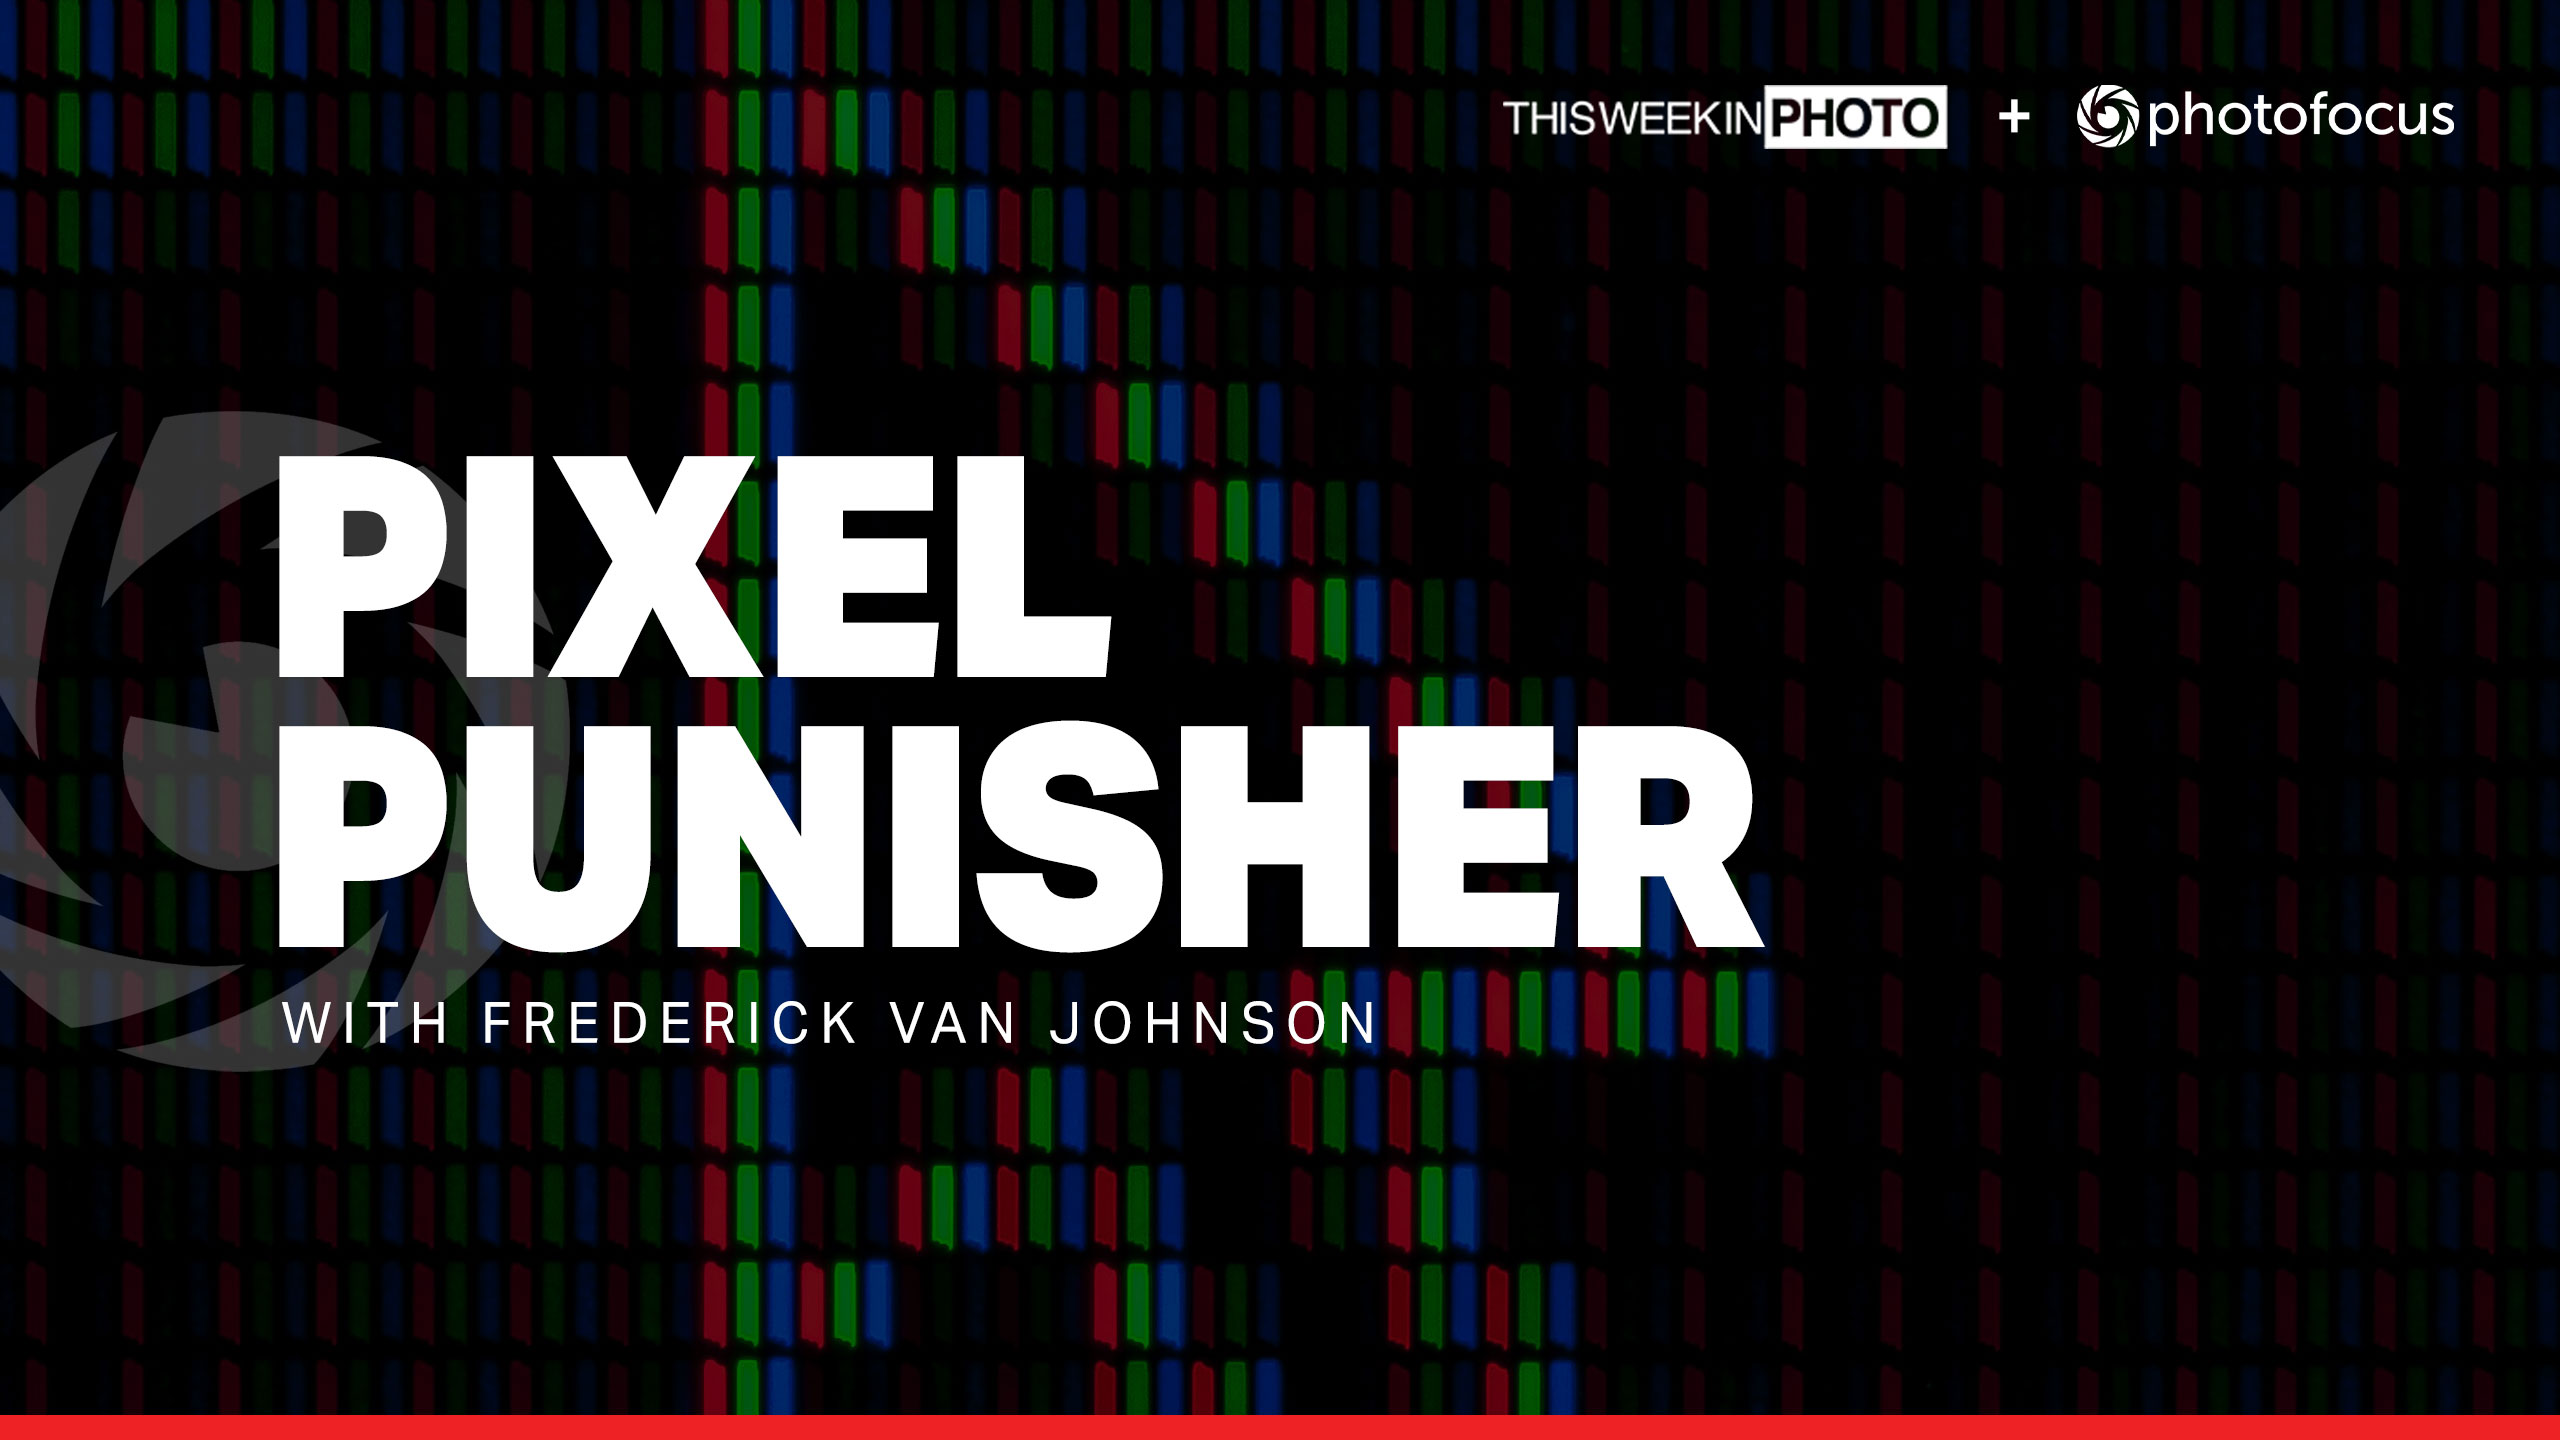 pixel-punisher-twip